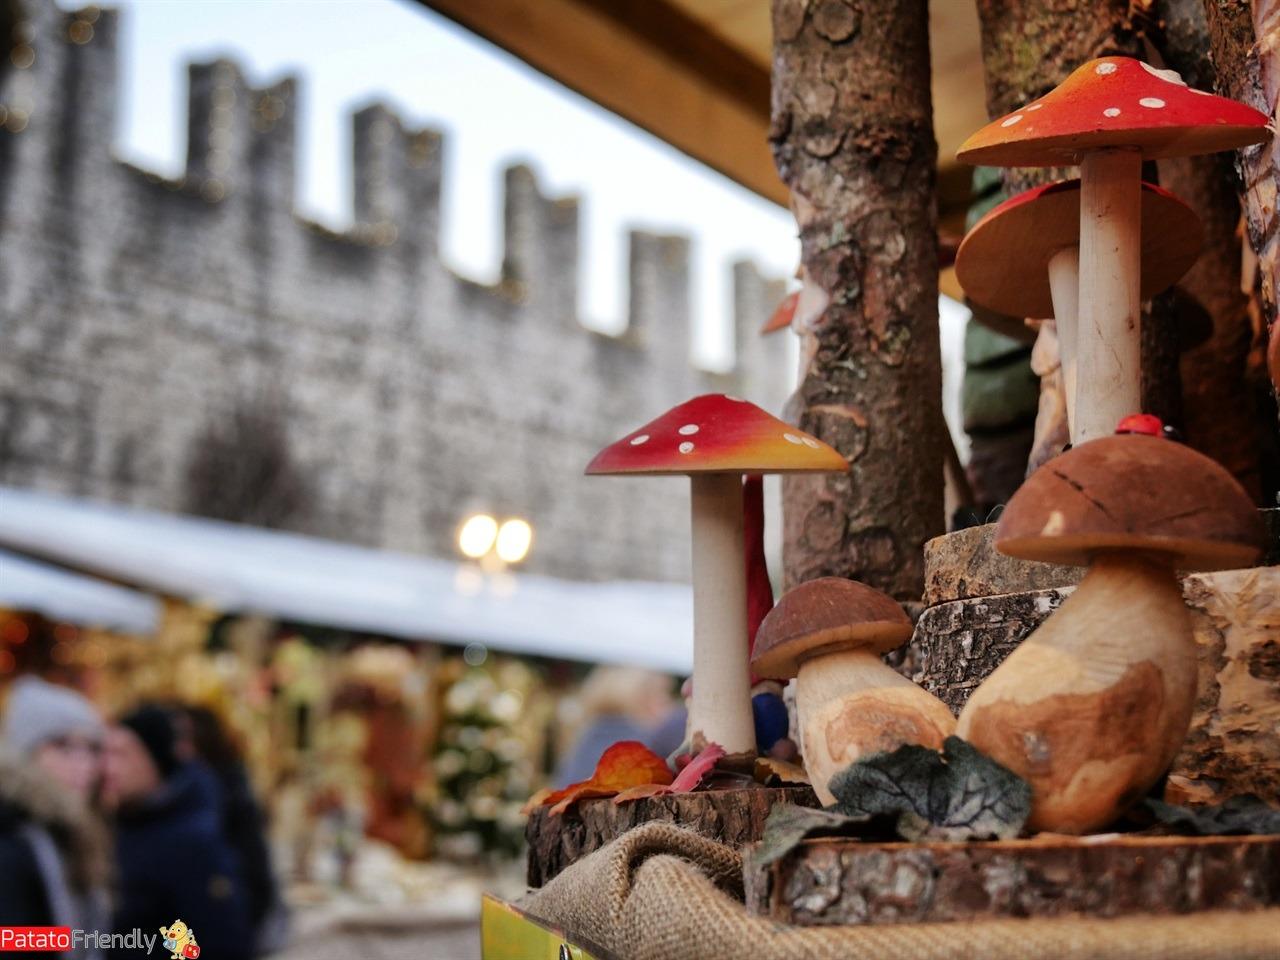 [cml_media_alt id='13147']Trento e i Mercatini di Natale[/cml_media_alt]